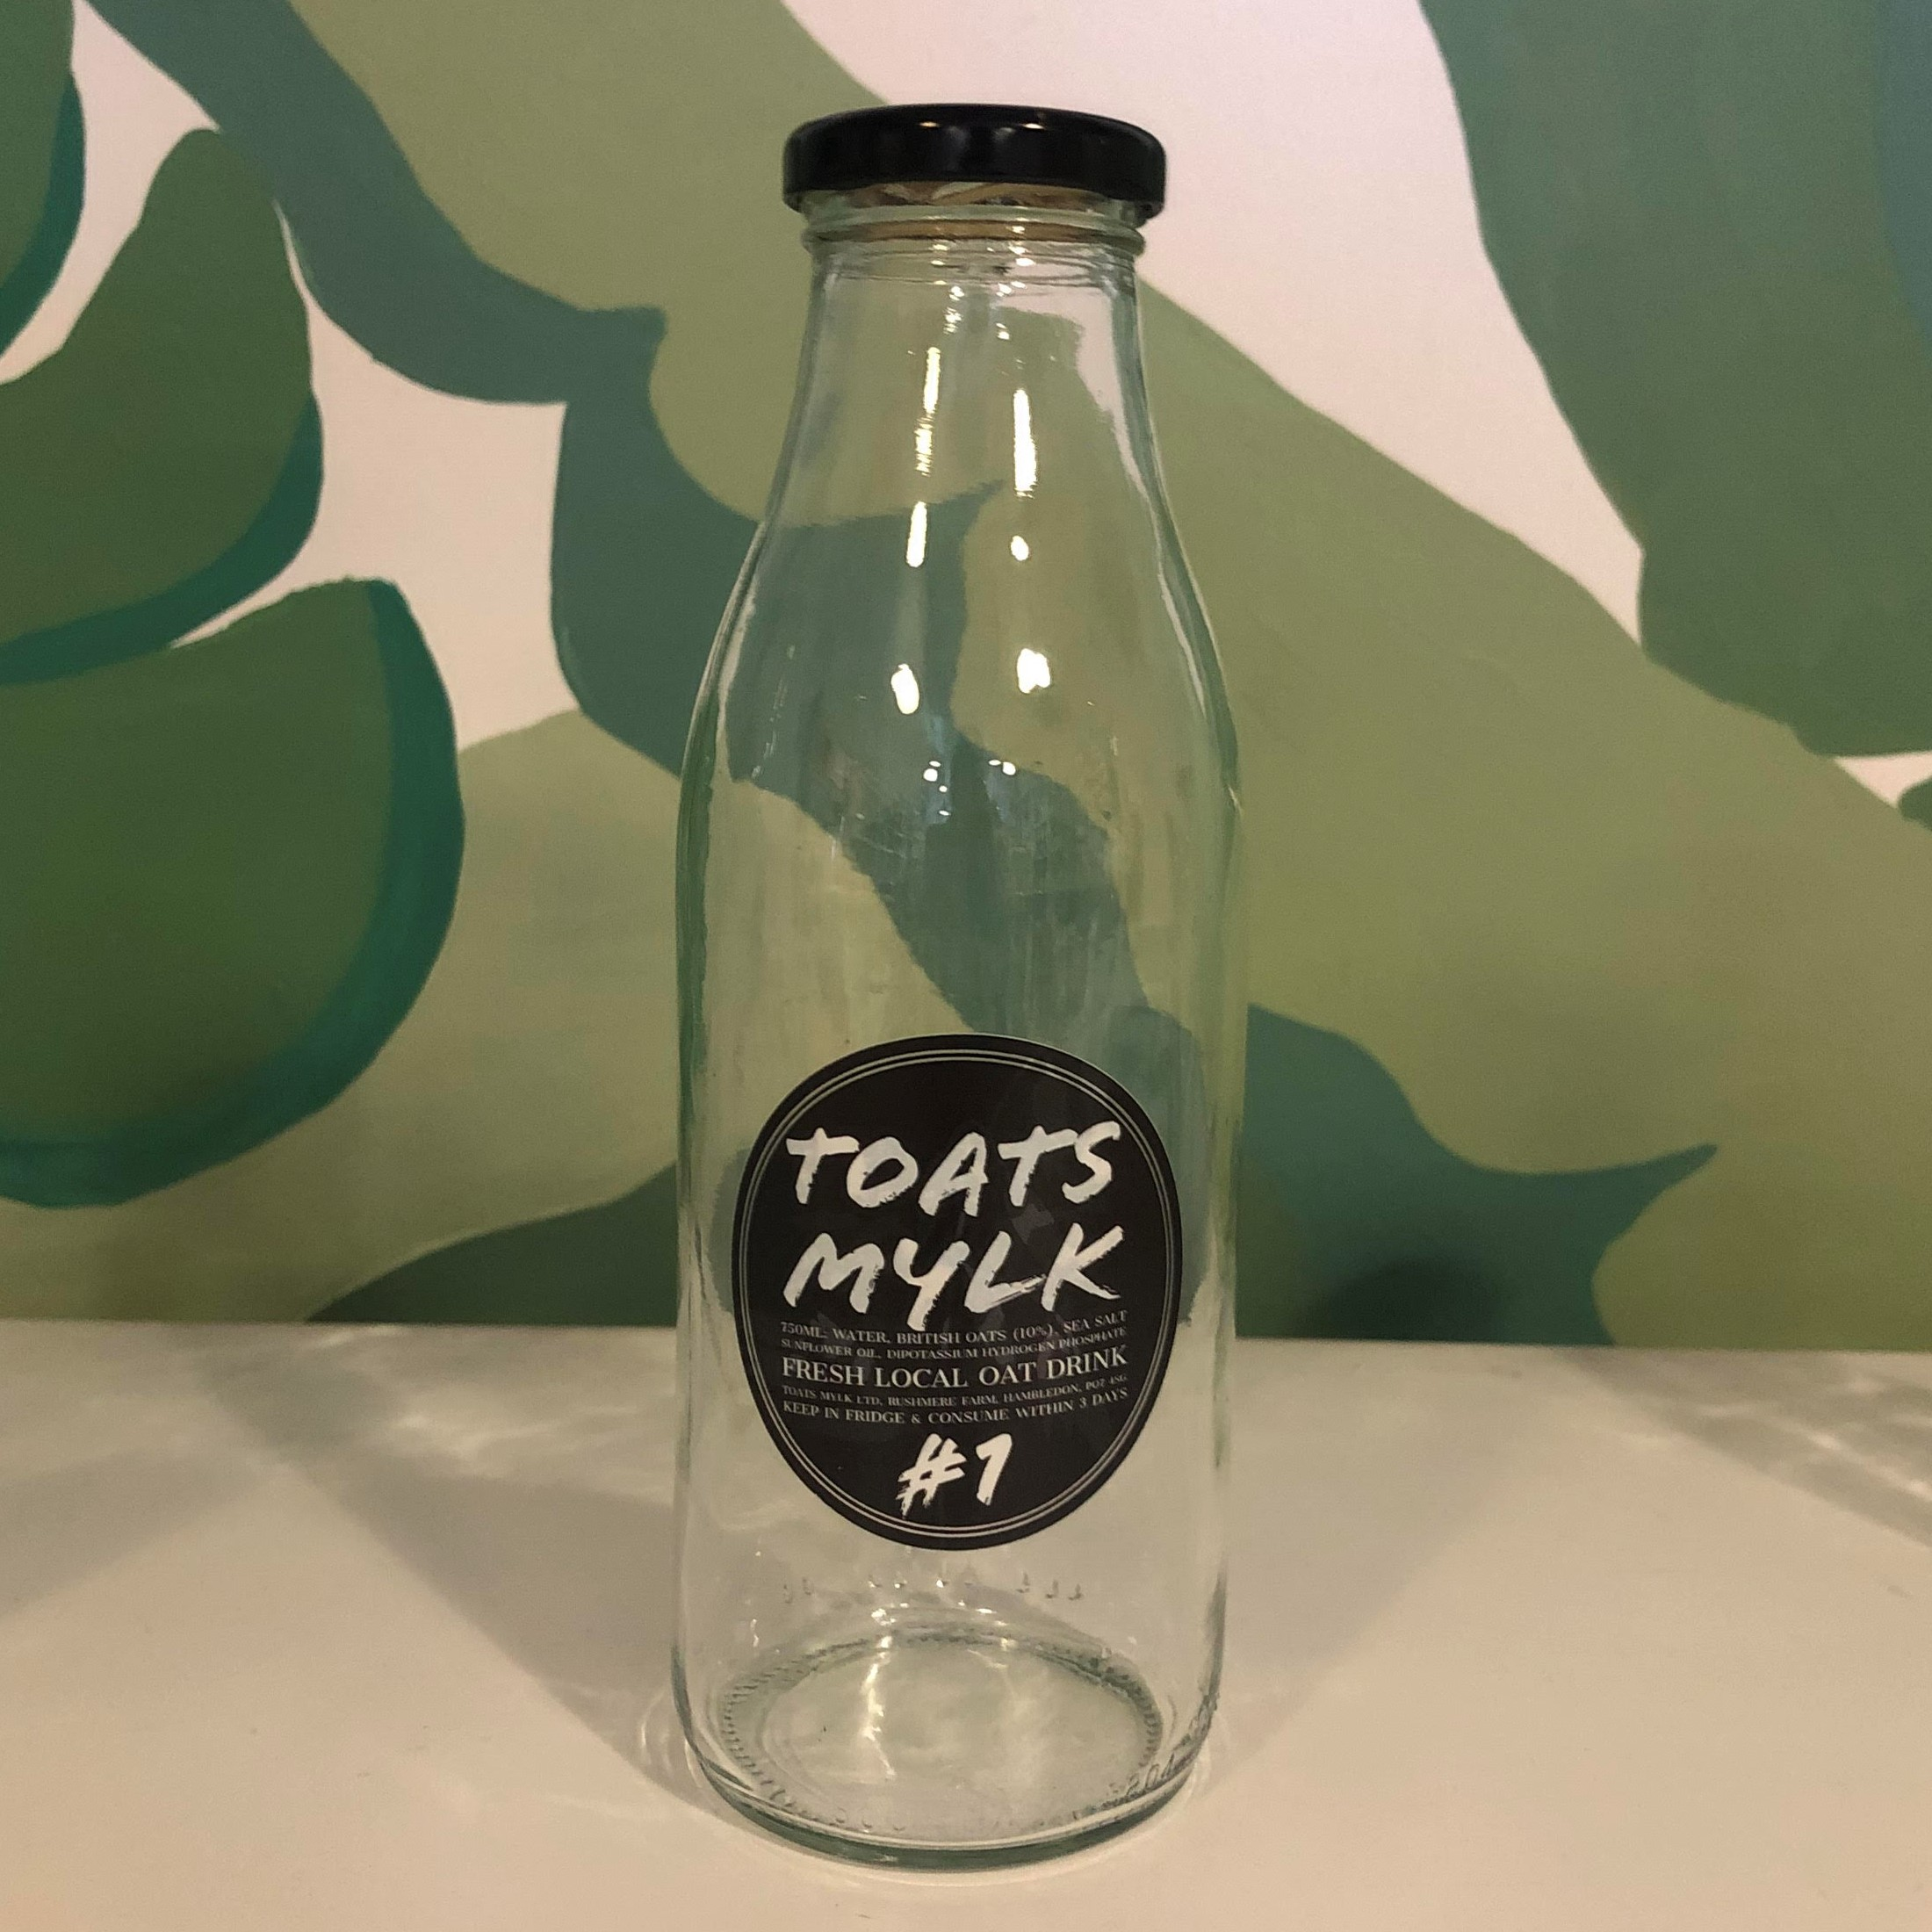 750ml Glass Bottle (TOATS MYLK)